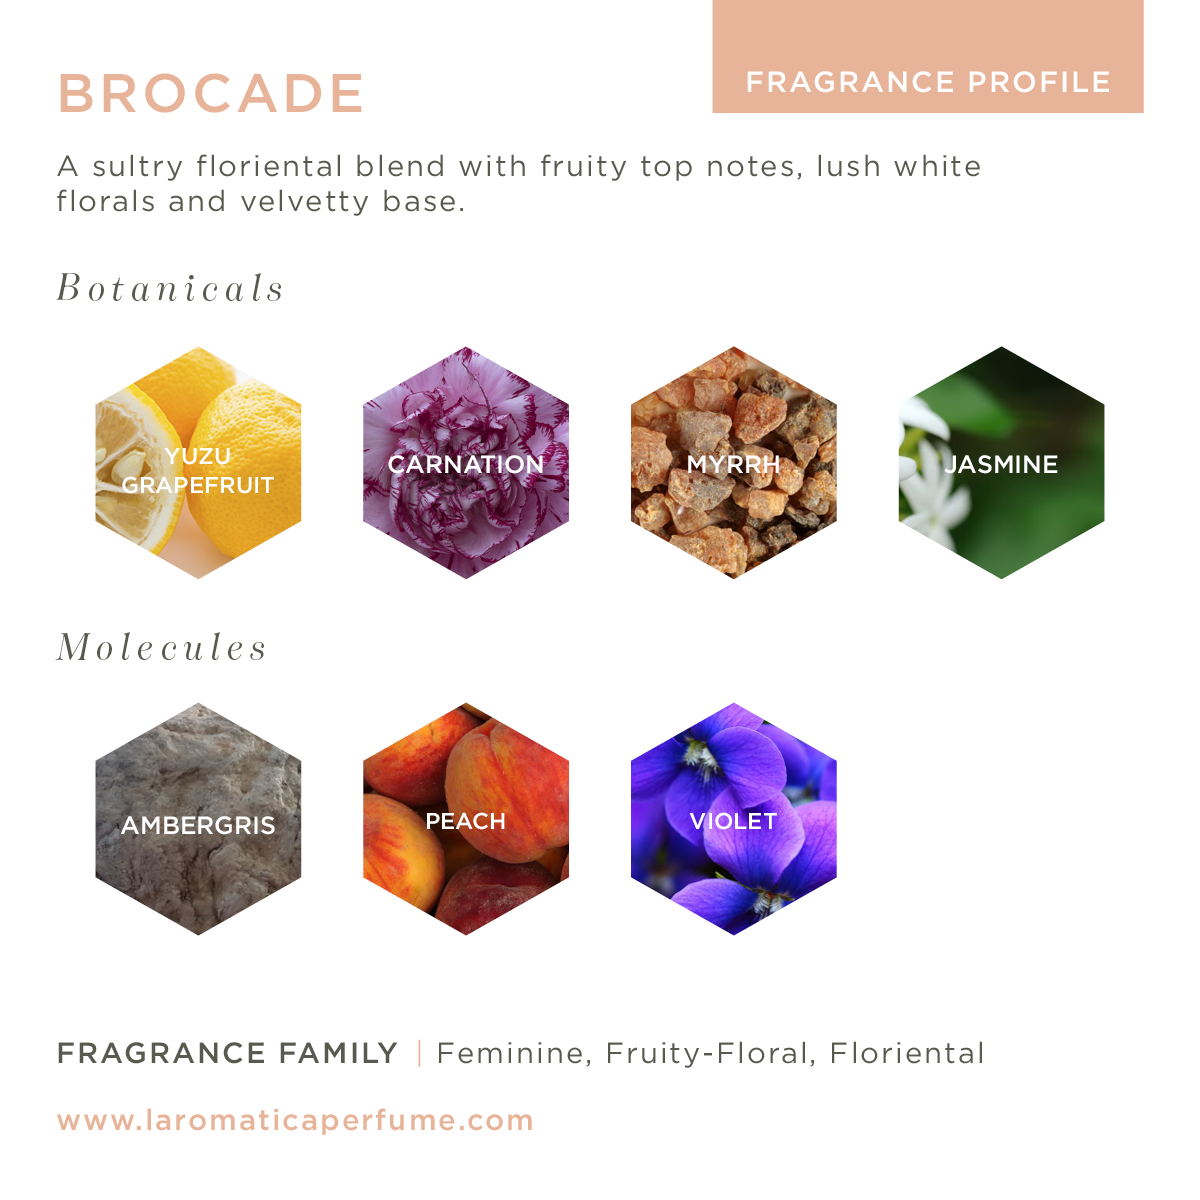 Image of Brocade